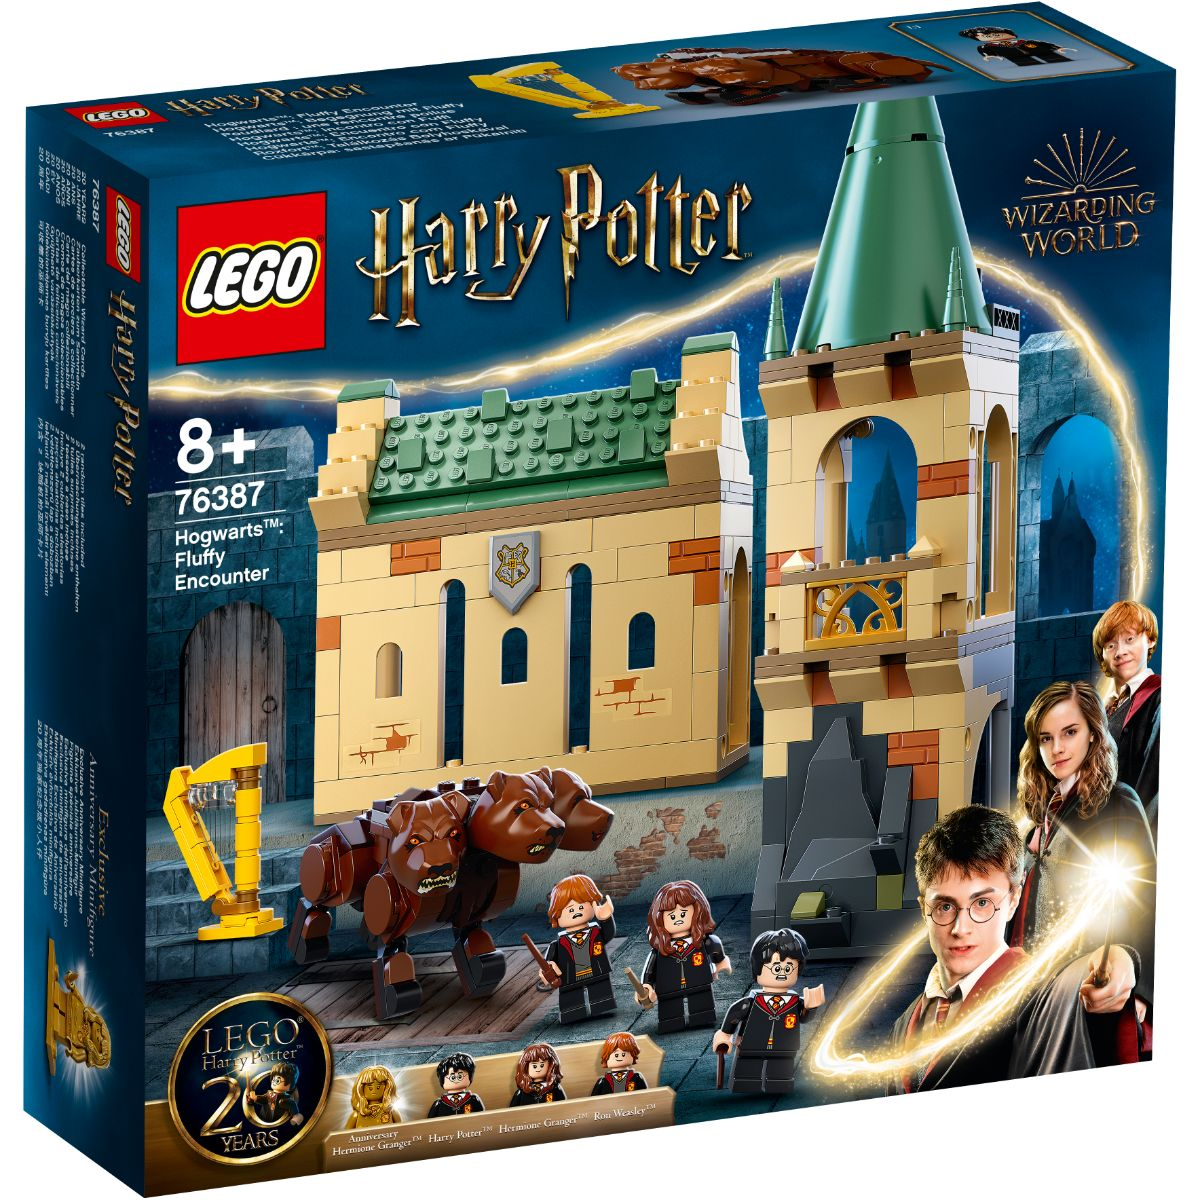 LEGO® Harry Potter - Hogwarts Intalnirea cu Fluffy (76387)